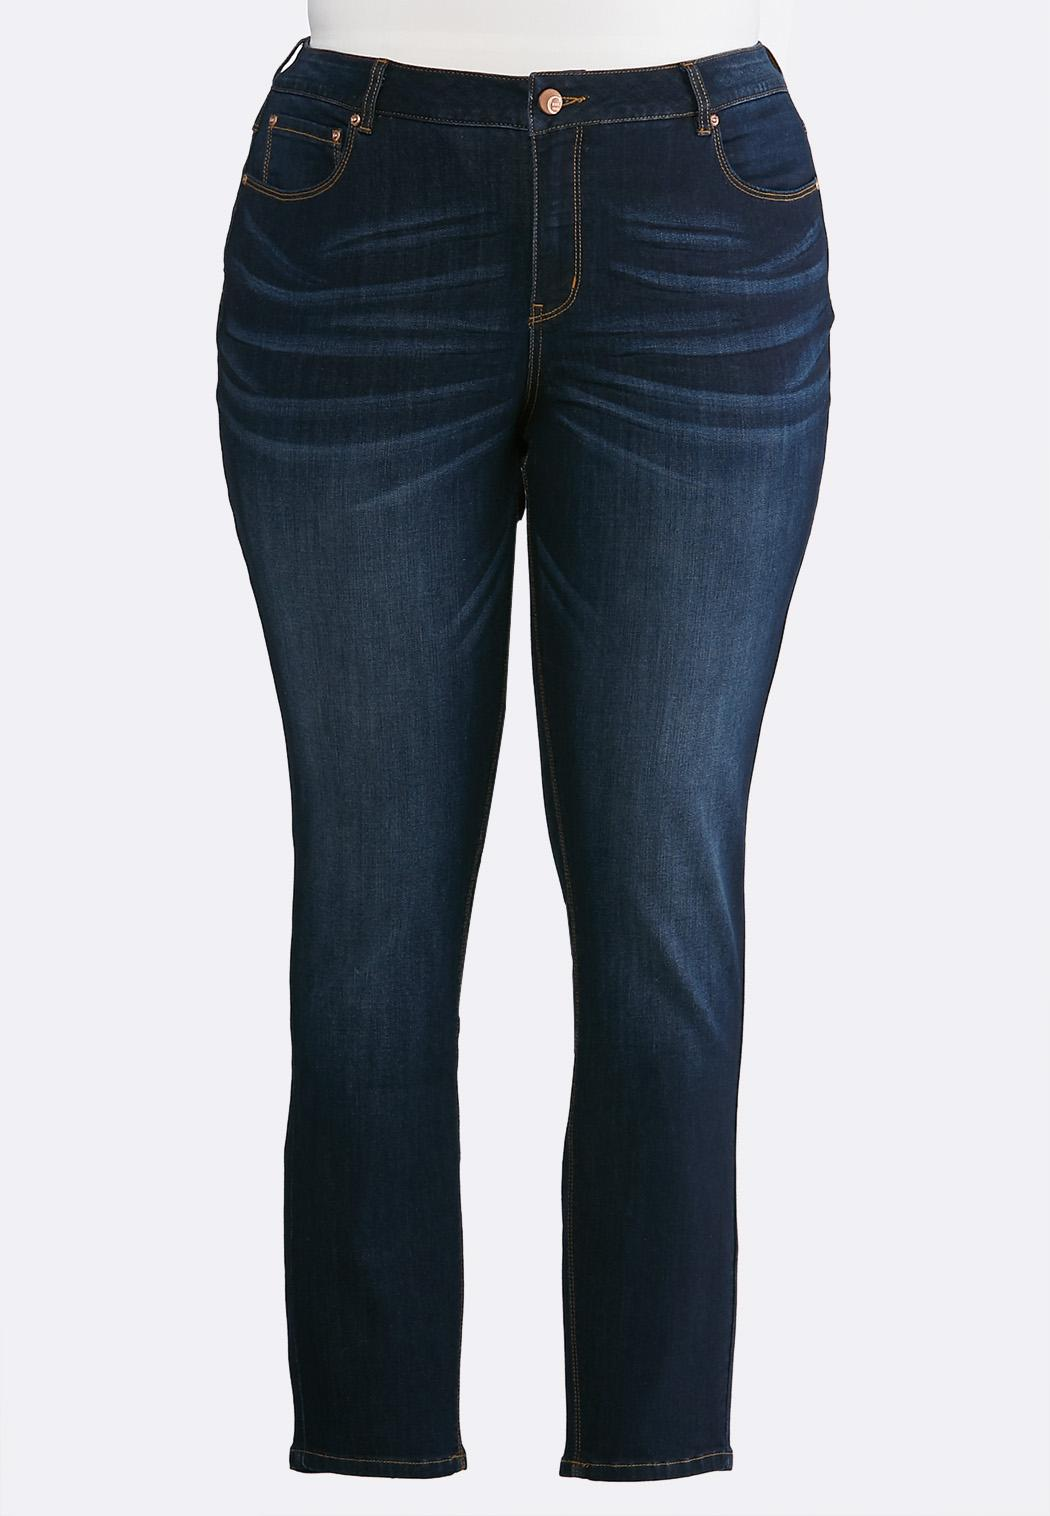 Plus Size Dark Denim Jeans